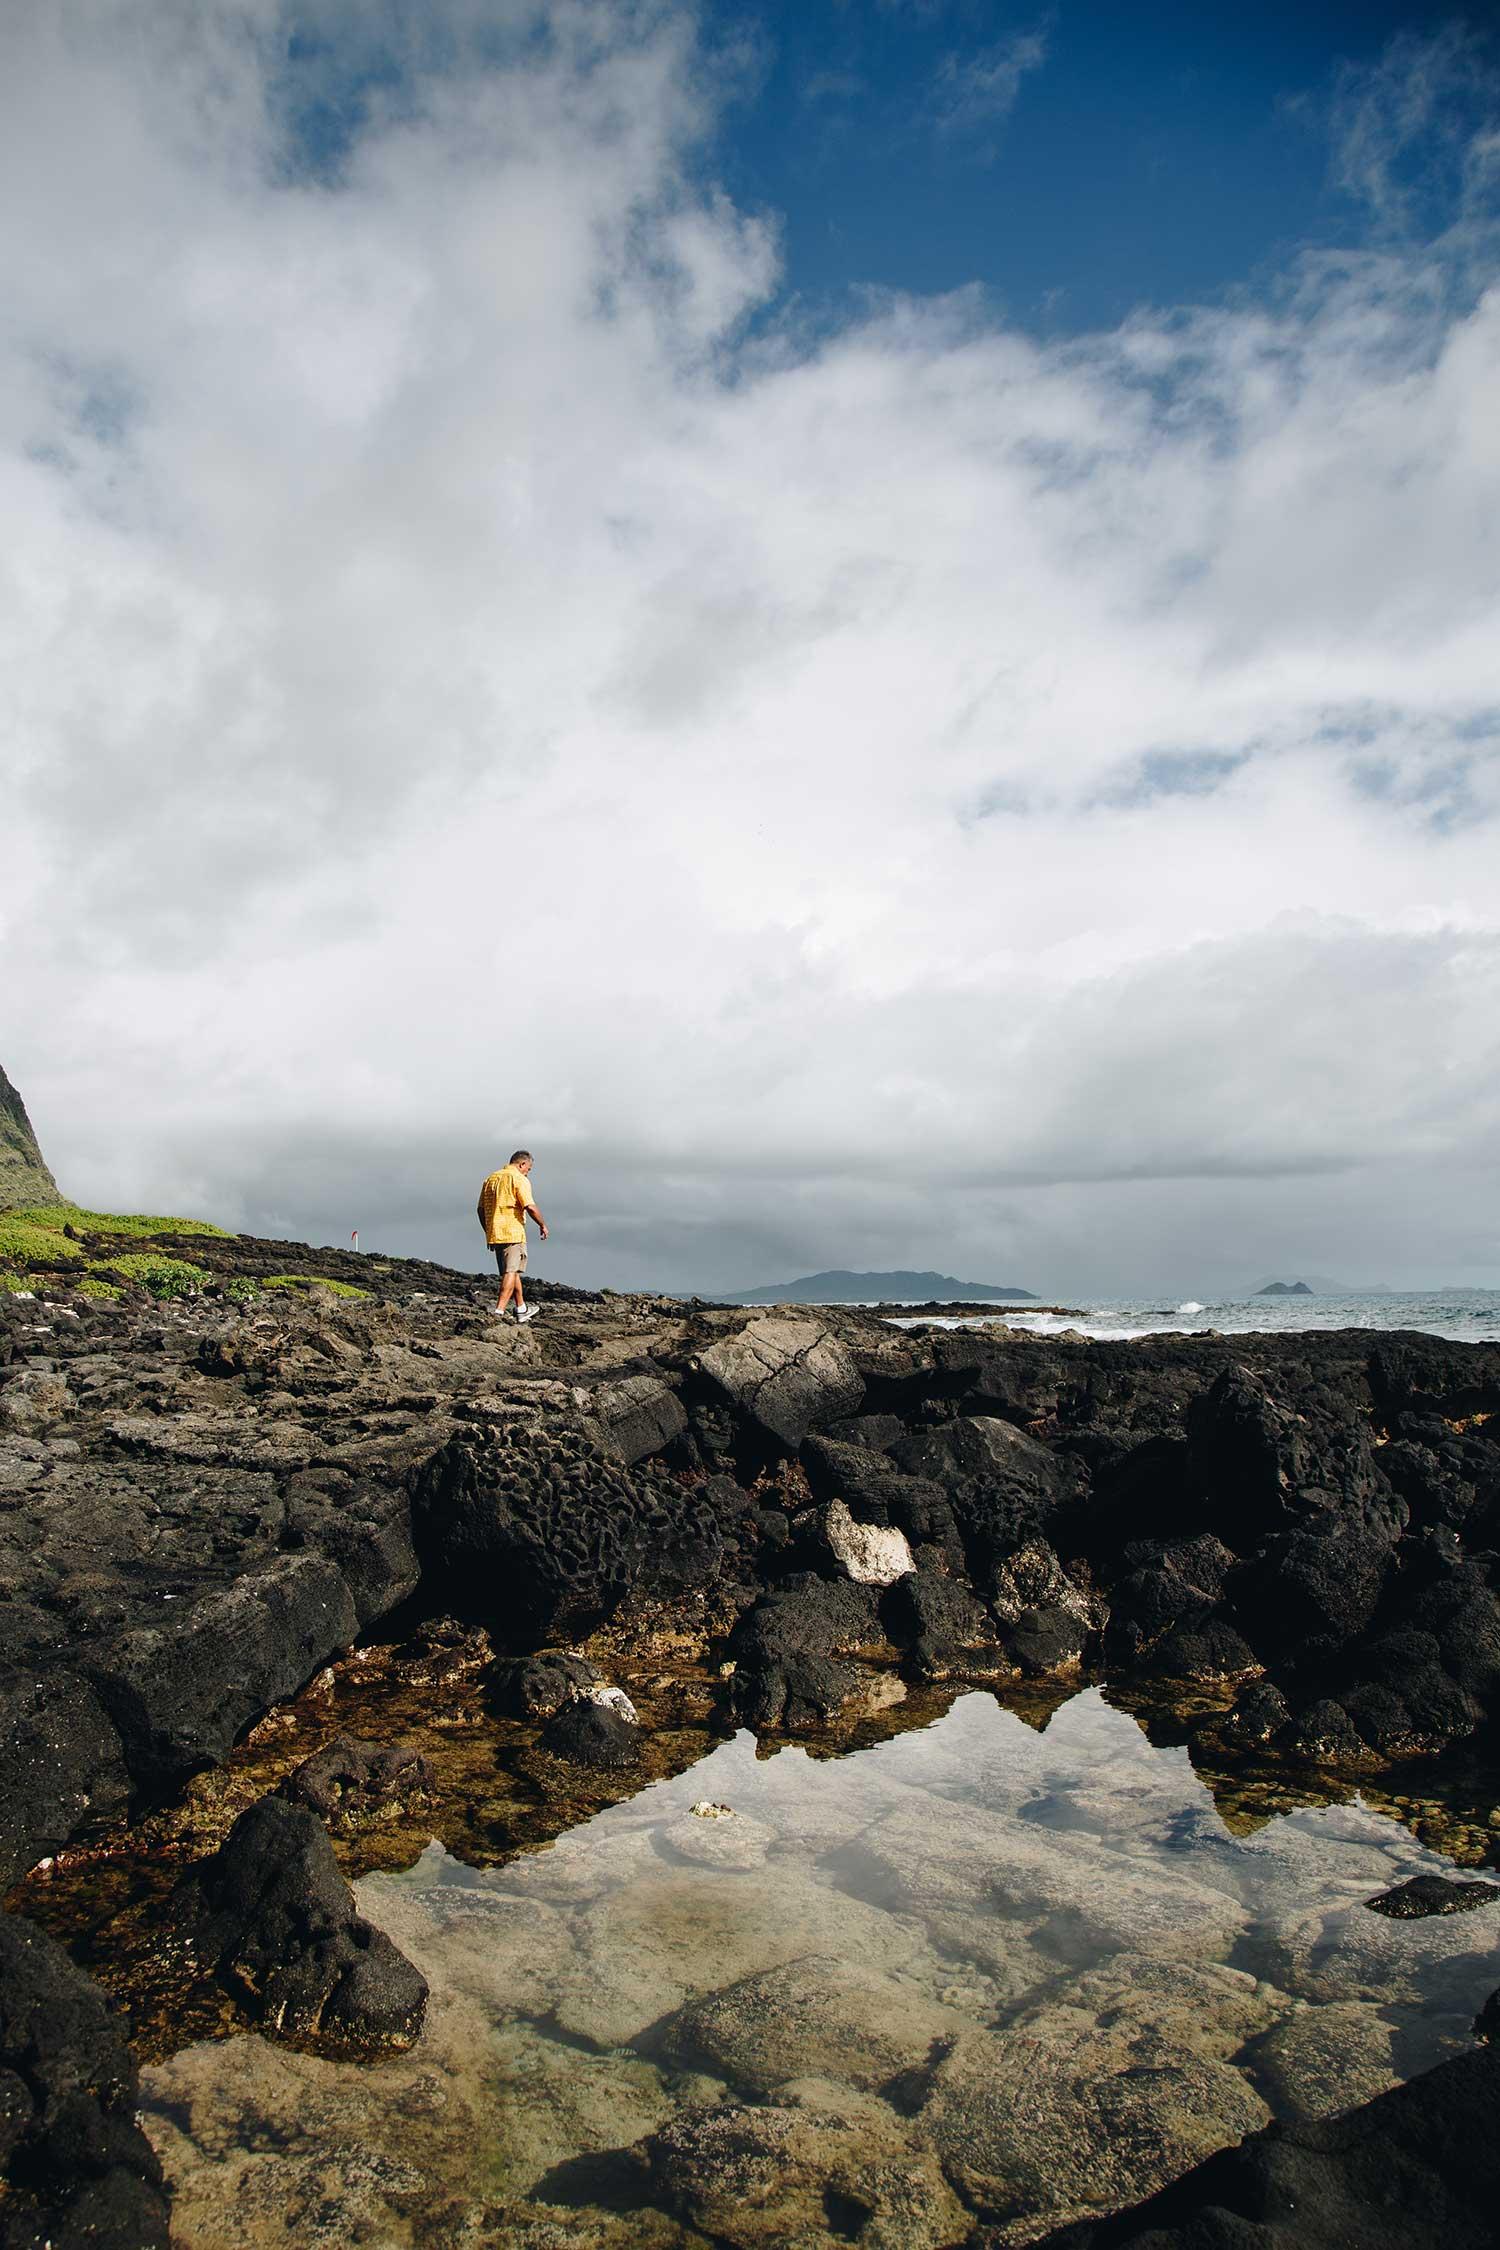 Norman Berg walking the coastline